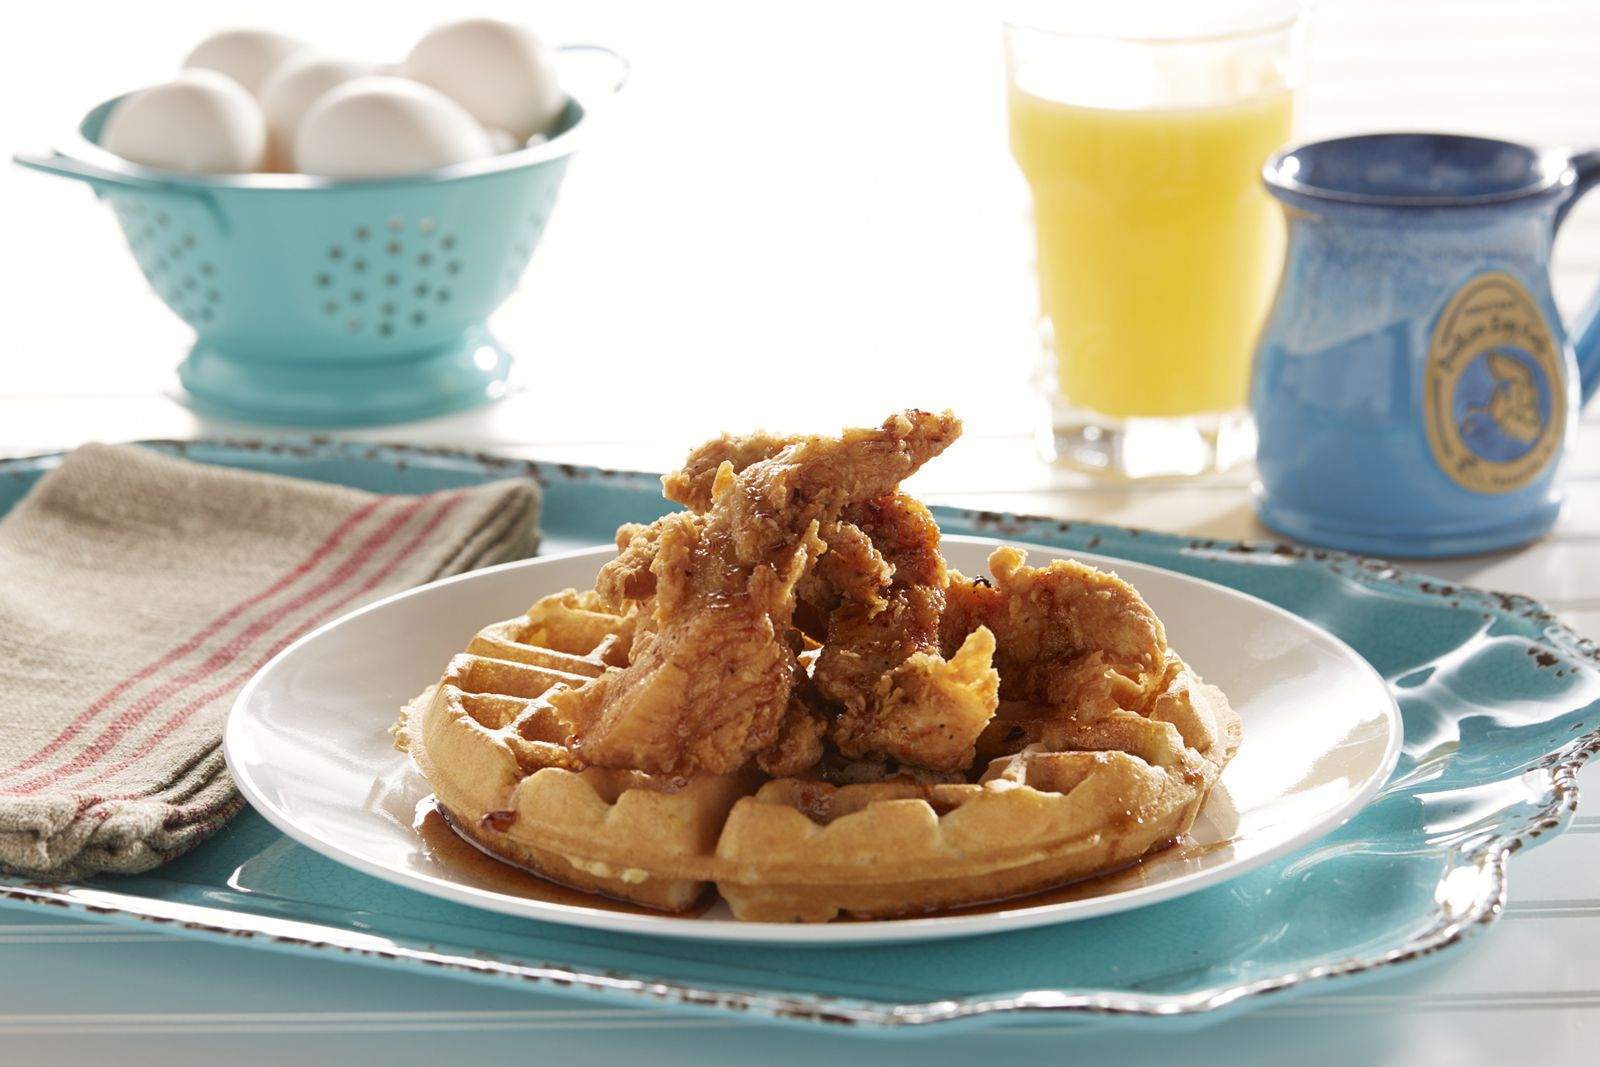 Another Broken Egg Cafe Chicken & Waffles